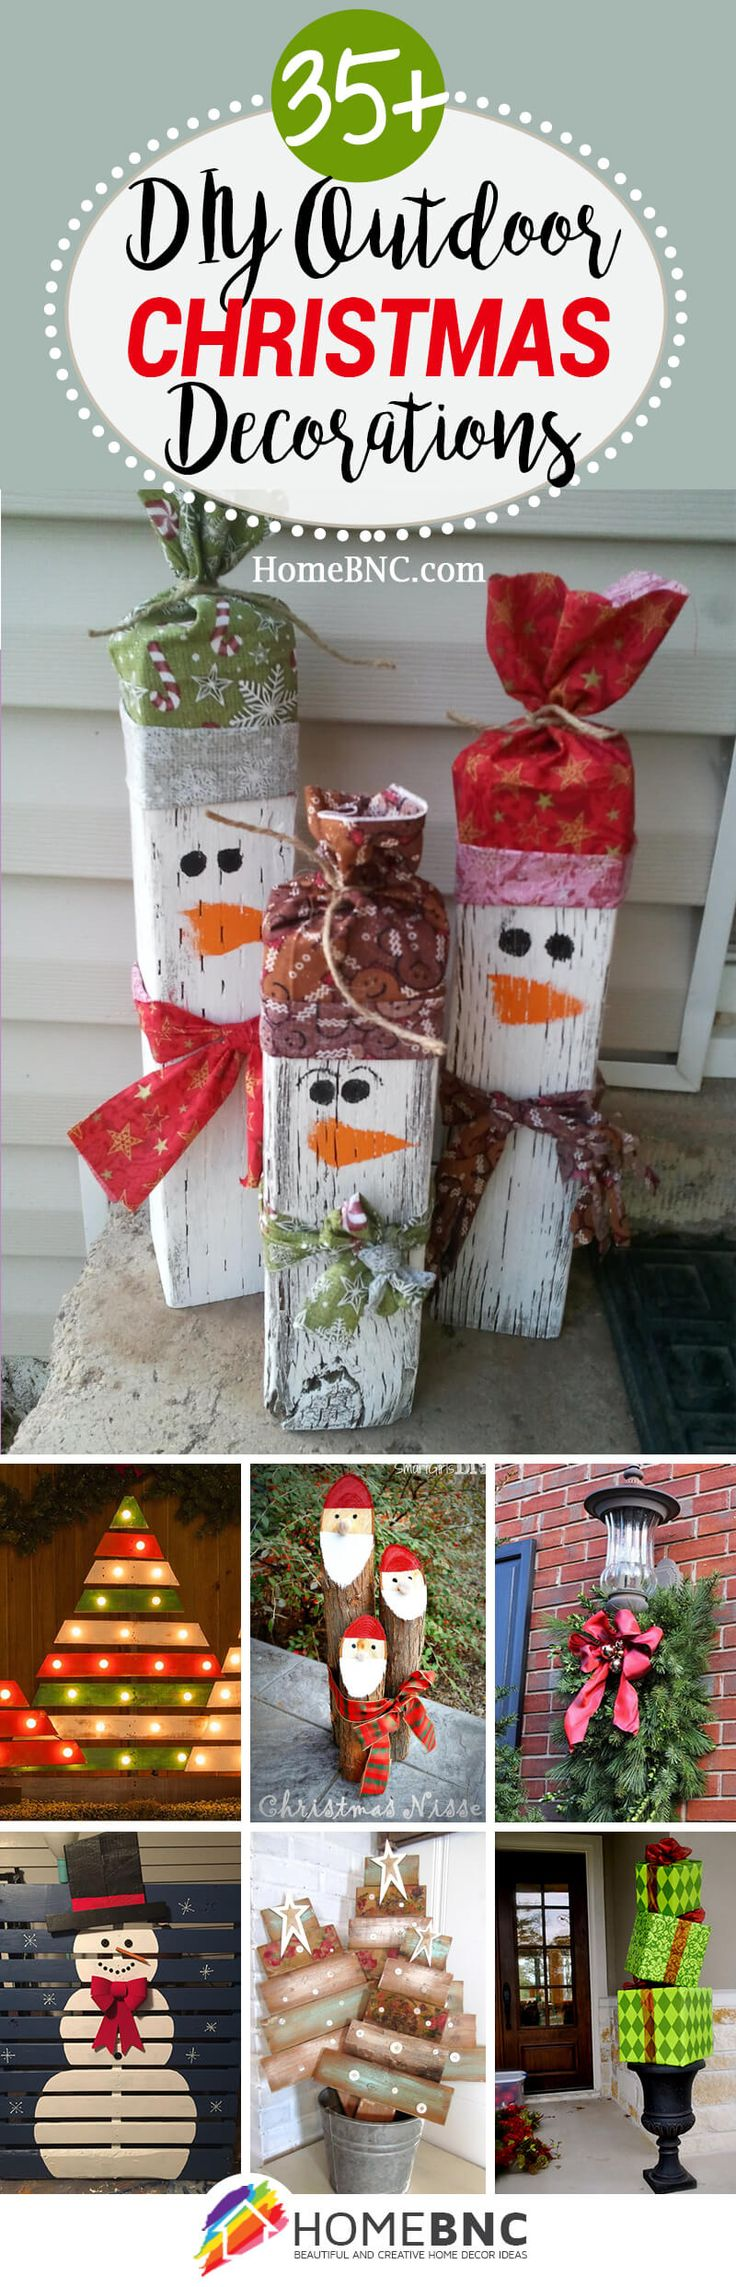 Christmas DIY Outdoor Decor Ideas #christmas#outdoors